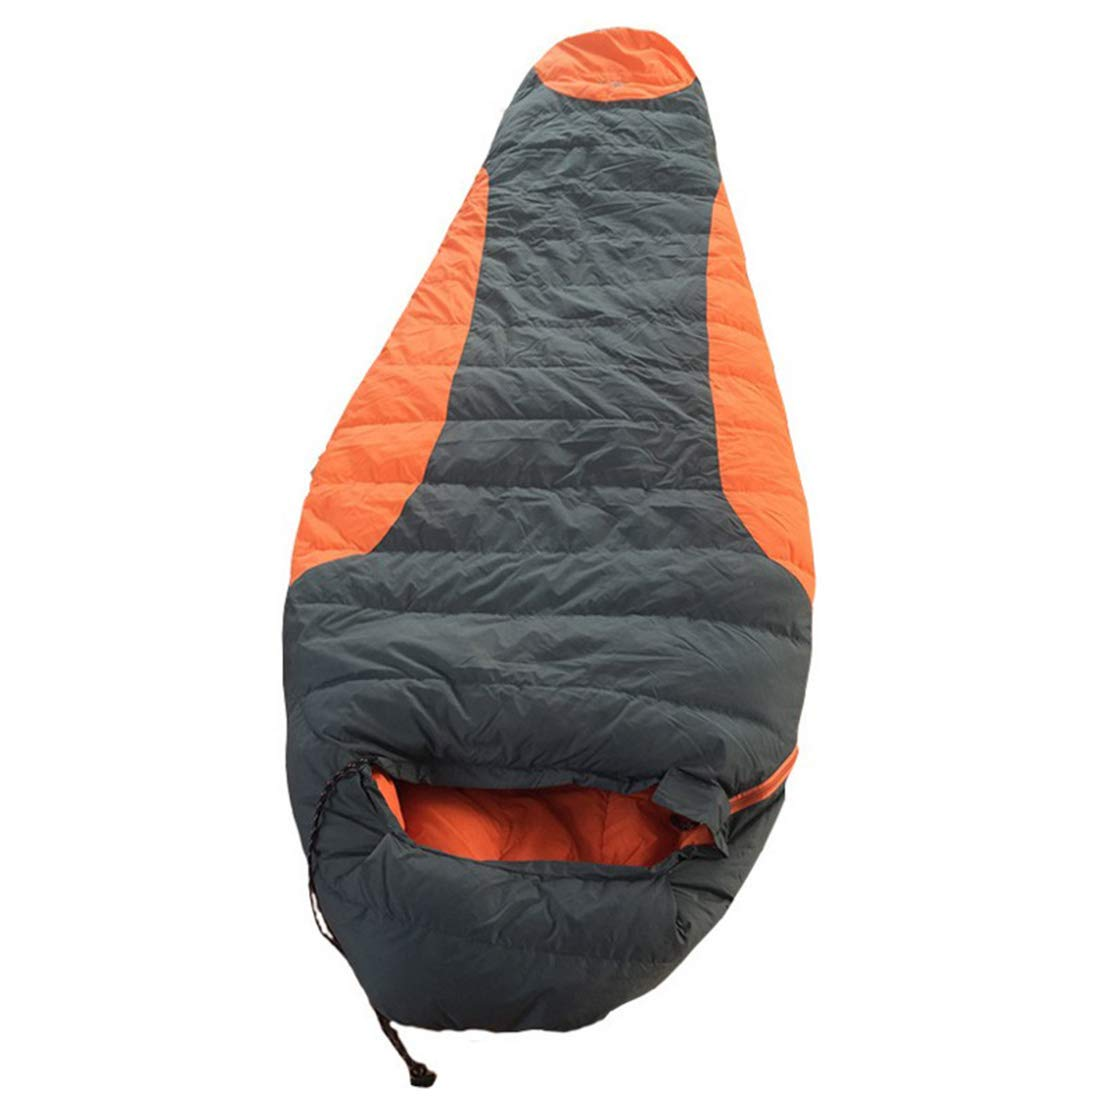 JOYS CLOTHING 屋外用多機能で便利な軽量、大人&子供用防水 - キャンプ用品寝袋 (Color : オレンジ)  オレンジ B07N3Z745Q